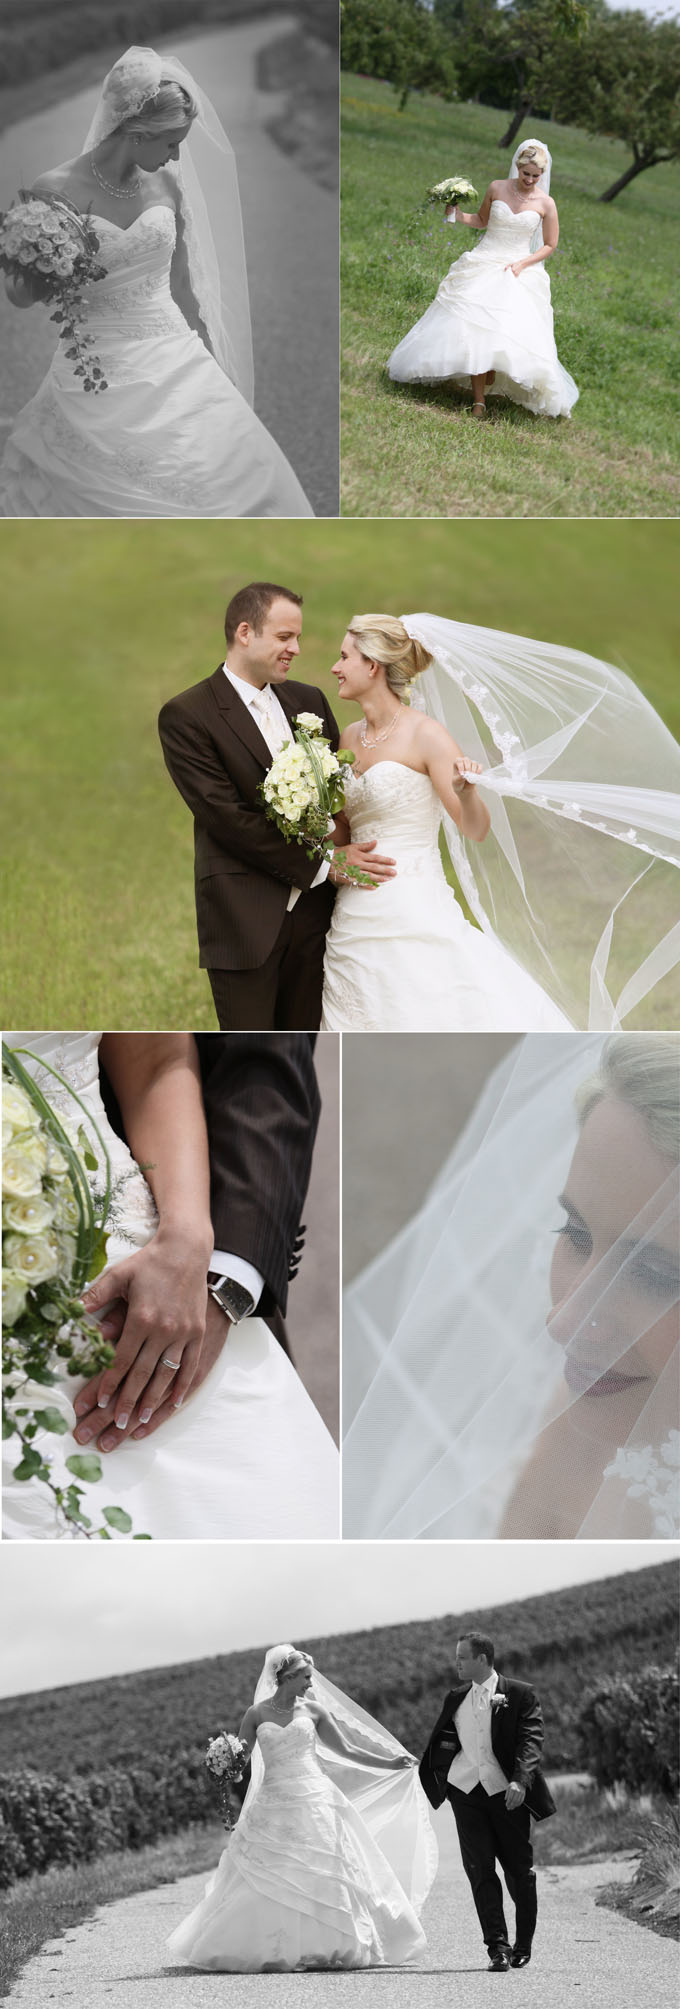 Hochzeitsfotograf Heilbronn Cleebronn Lauffen